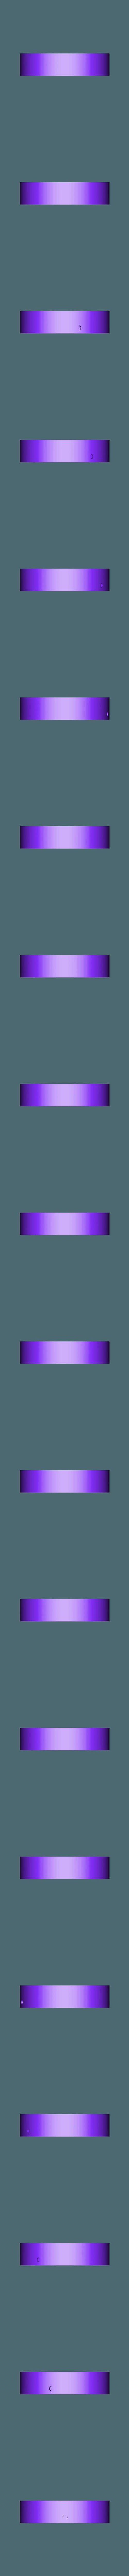 Case without column Half.stl Download STL file Shadow Lamp • 3D print model, MAyobe